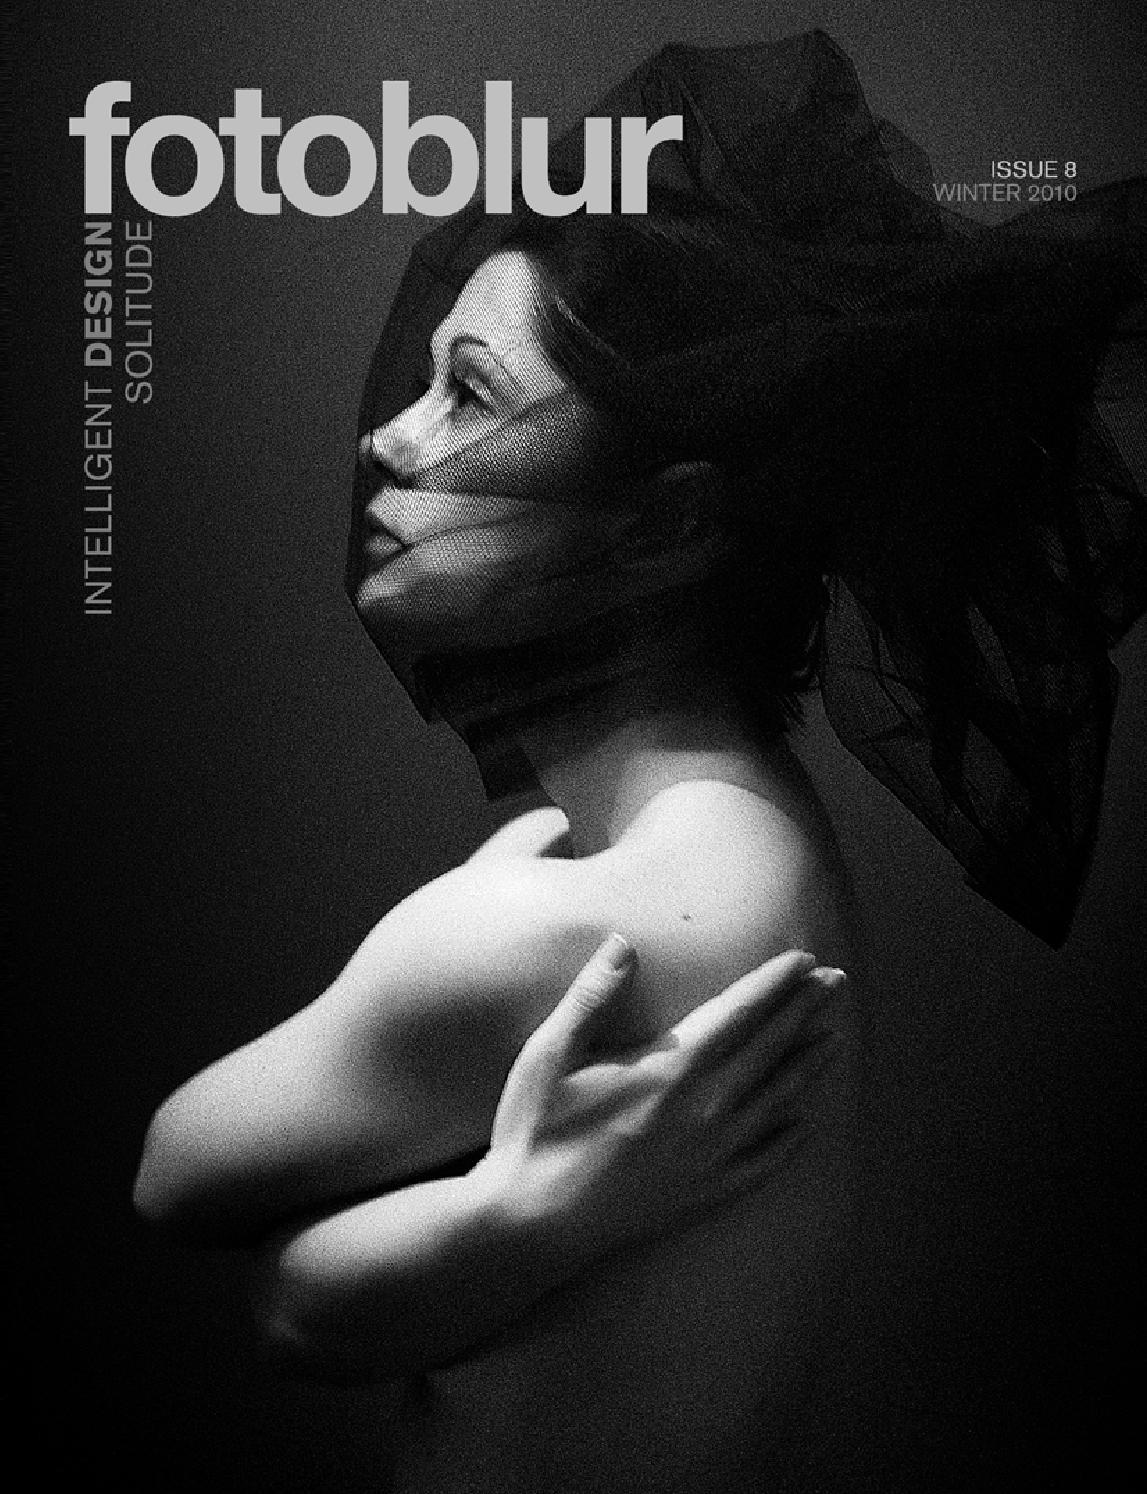 Fotoblur Magazine Issue 8